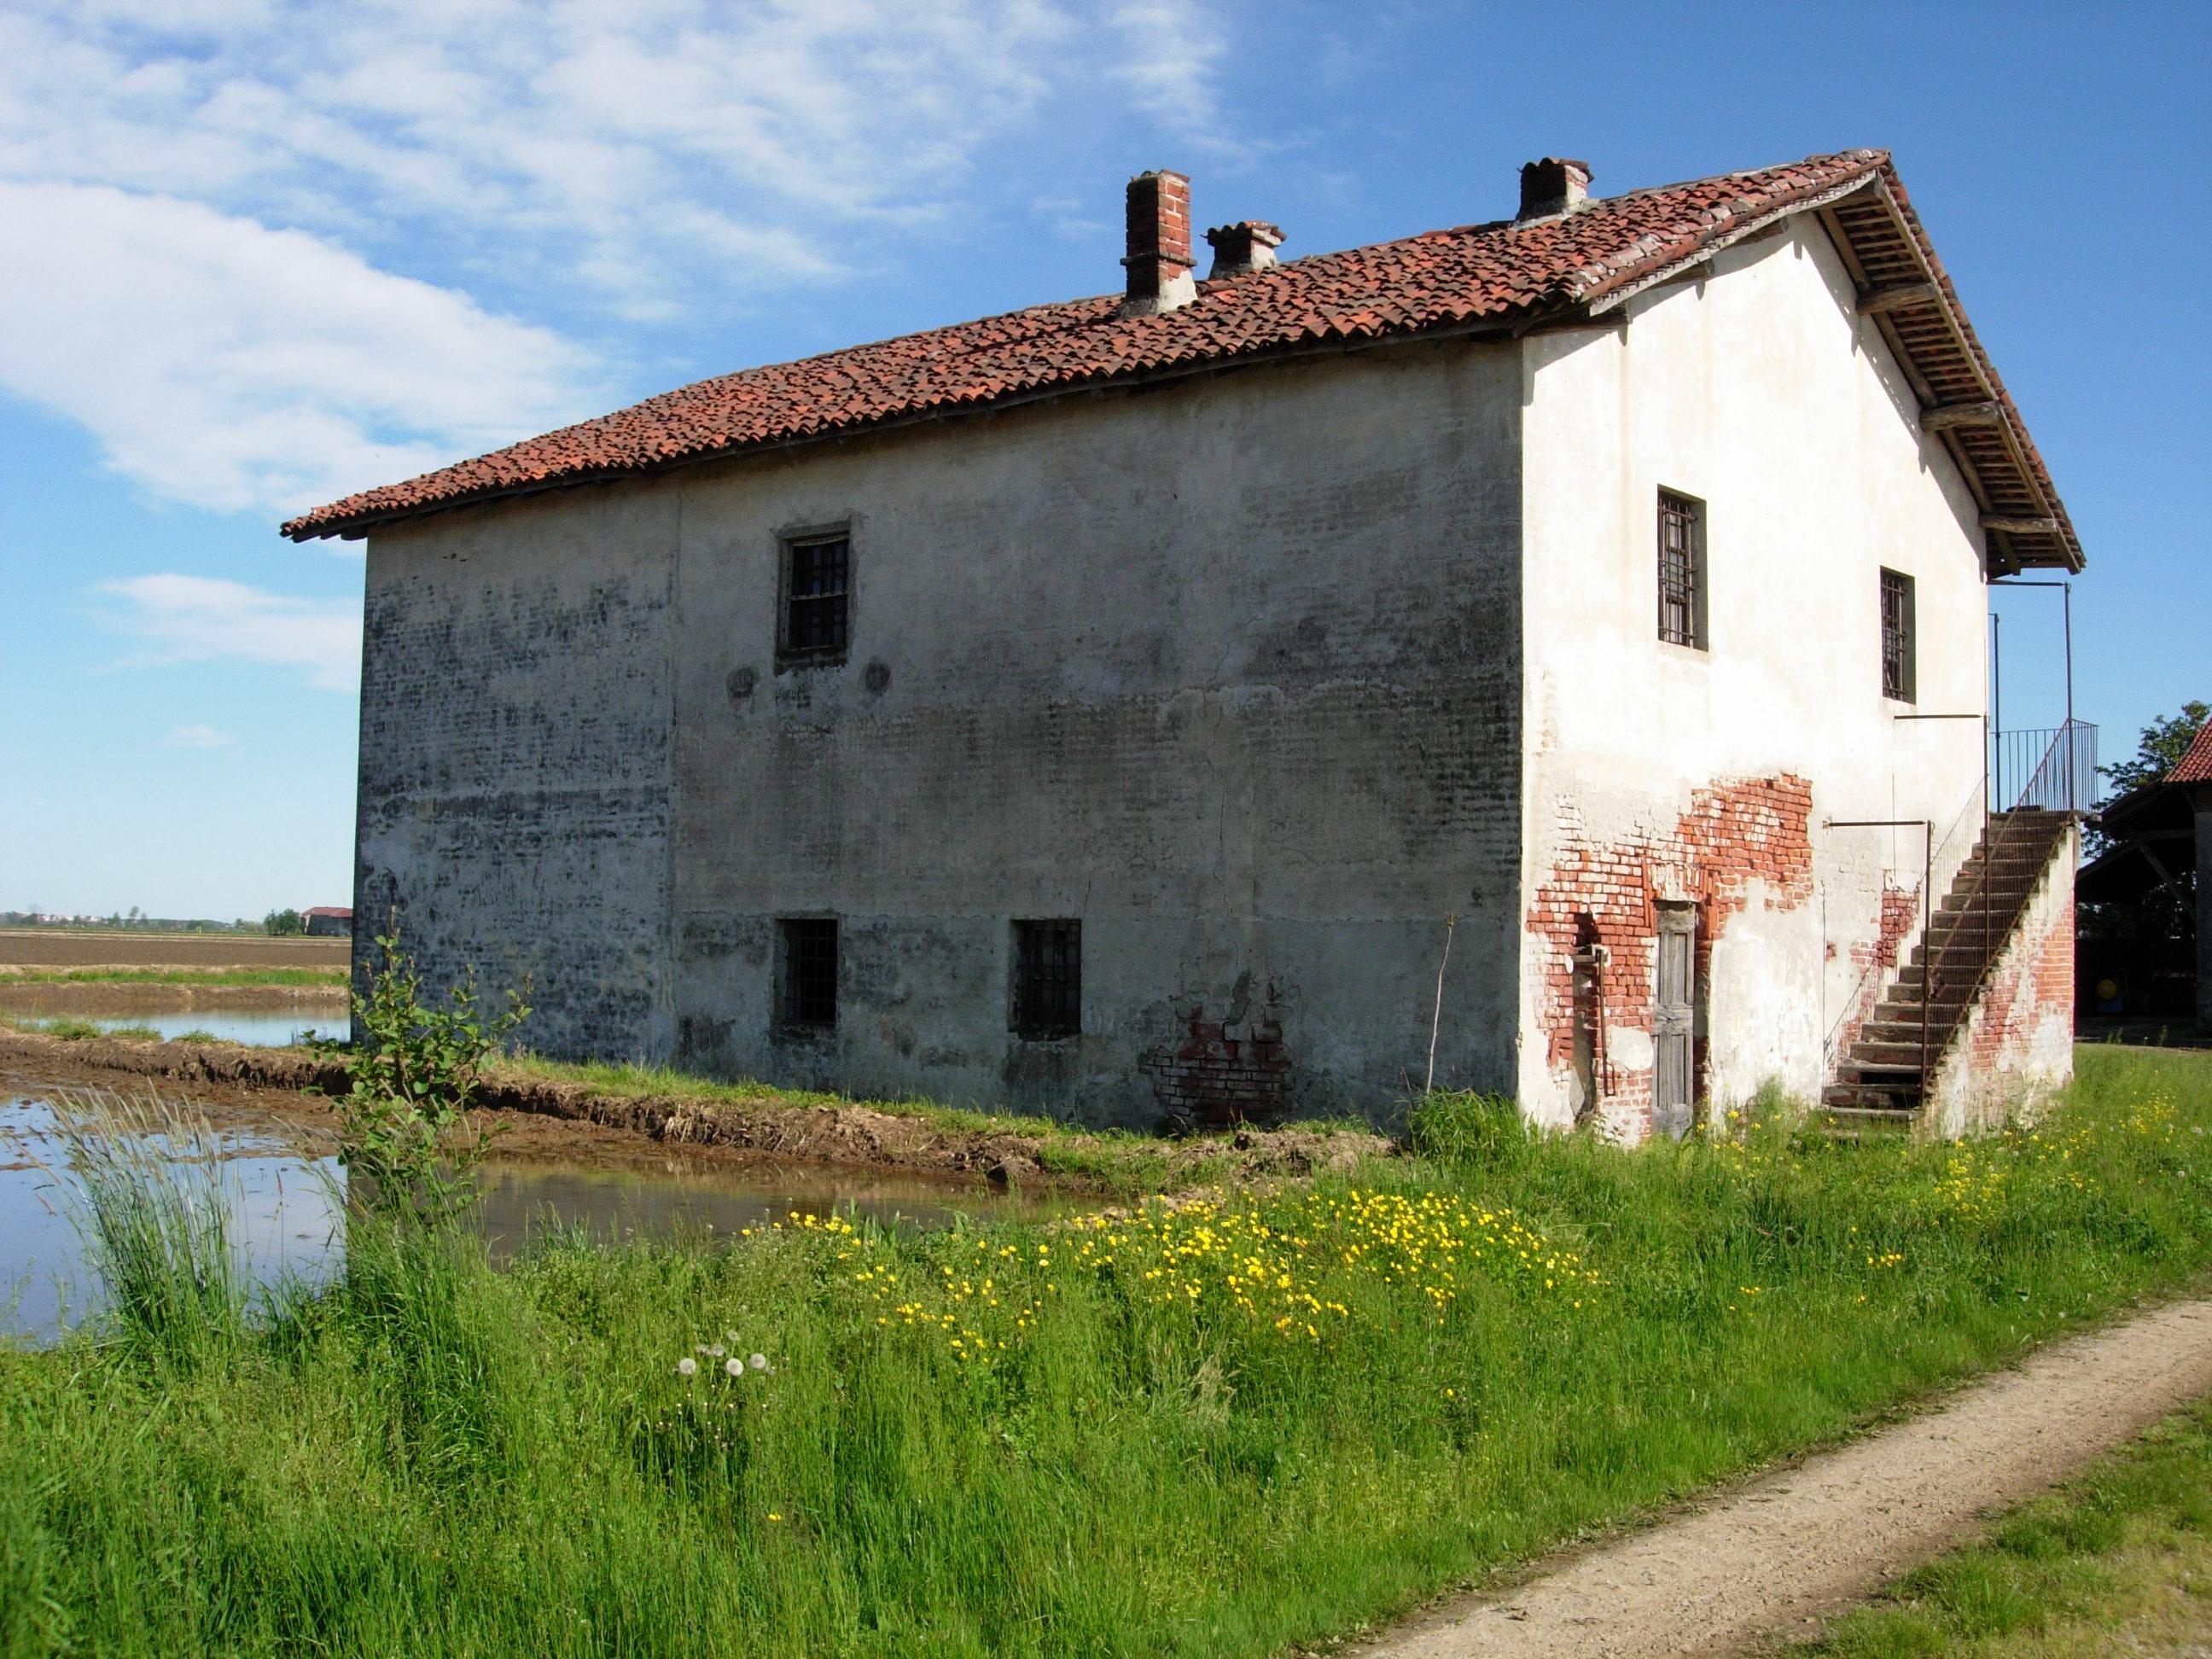 Casa-ex-forno-e-mondariso